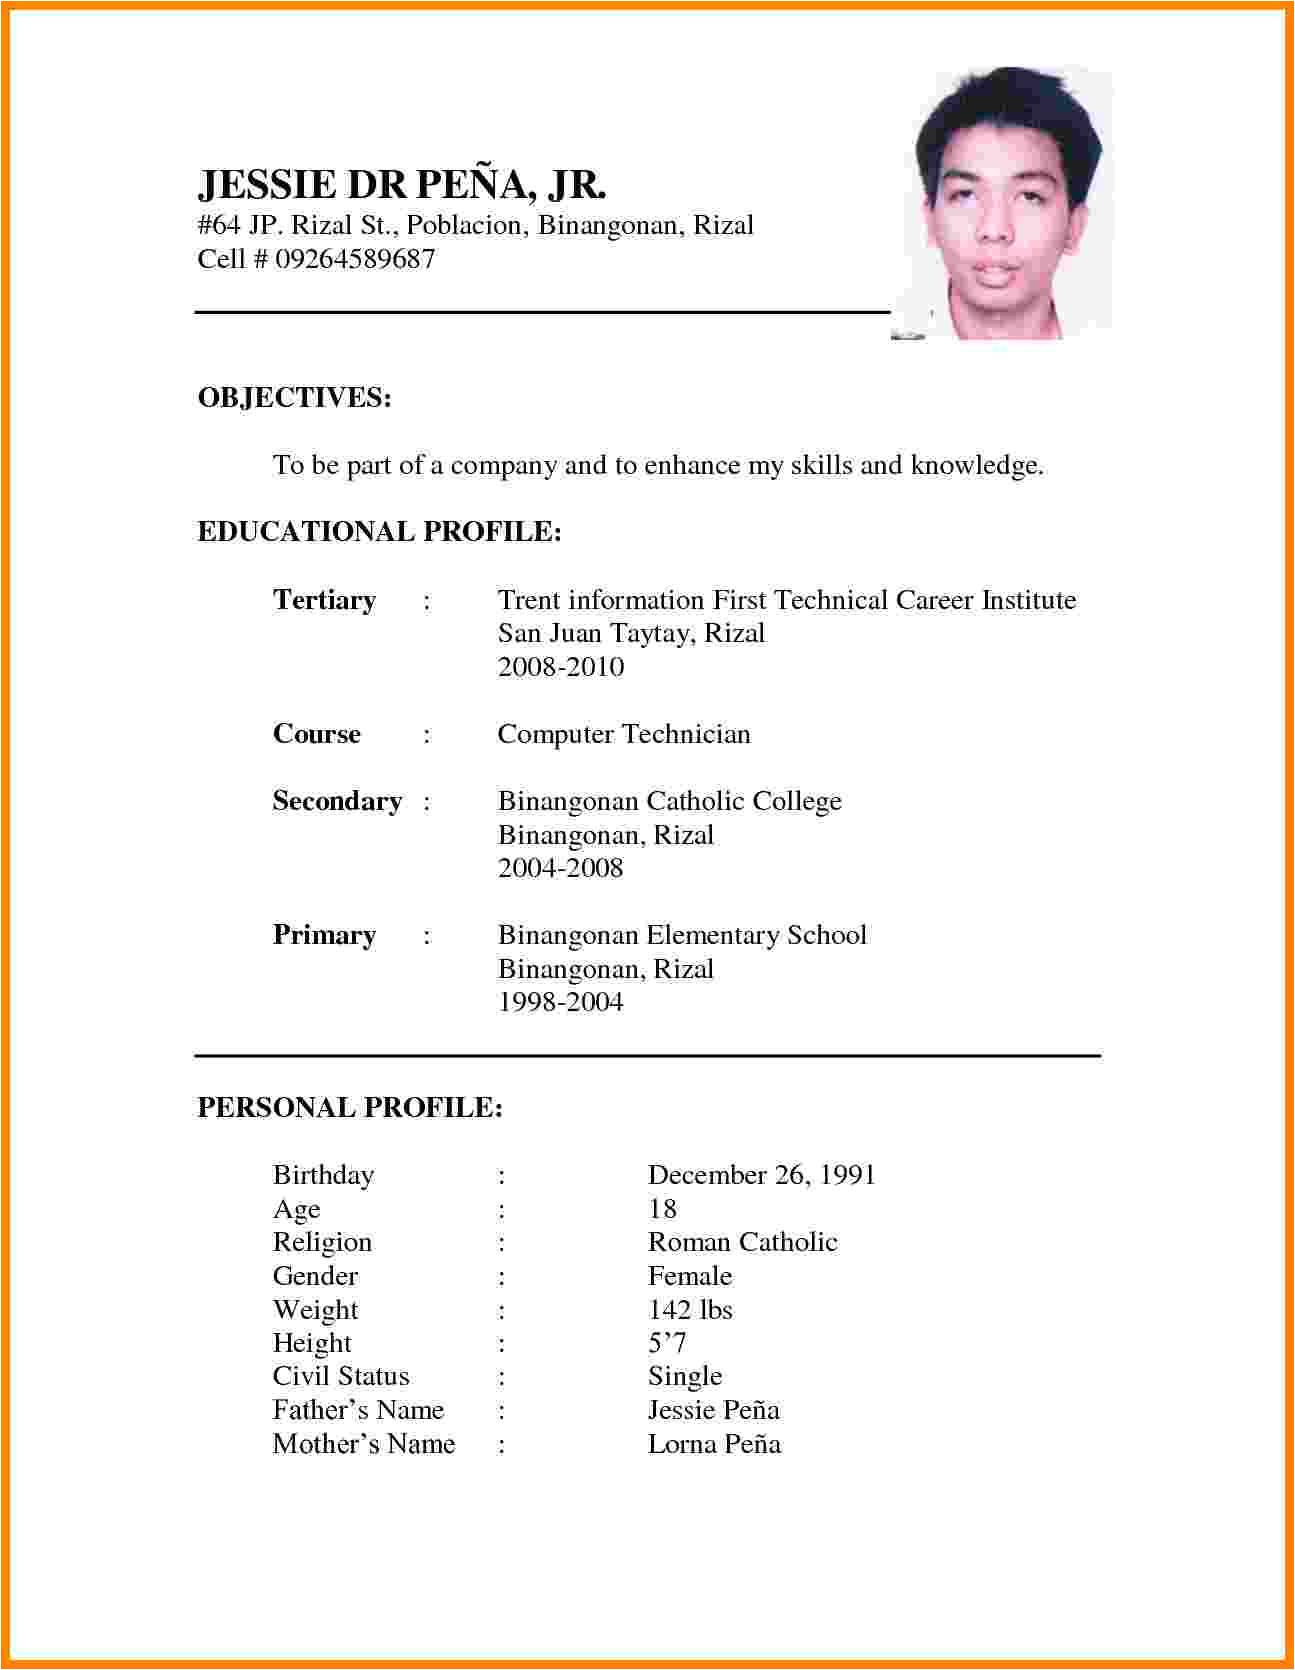 Sample Resume Letter for Job Application 11 Cv formats Samples for Job theorynpractice